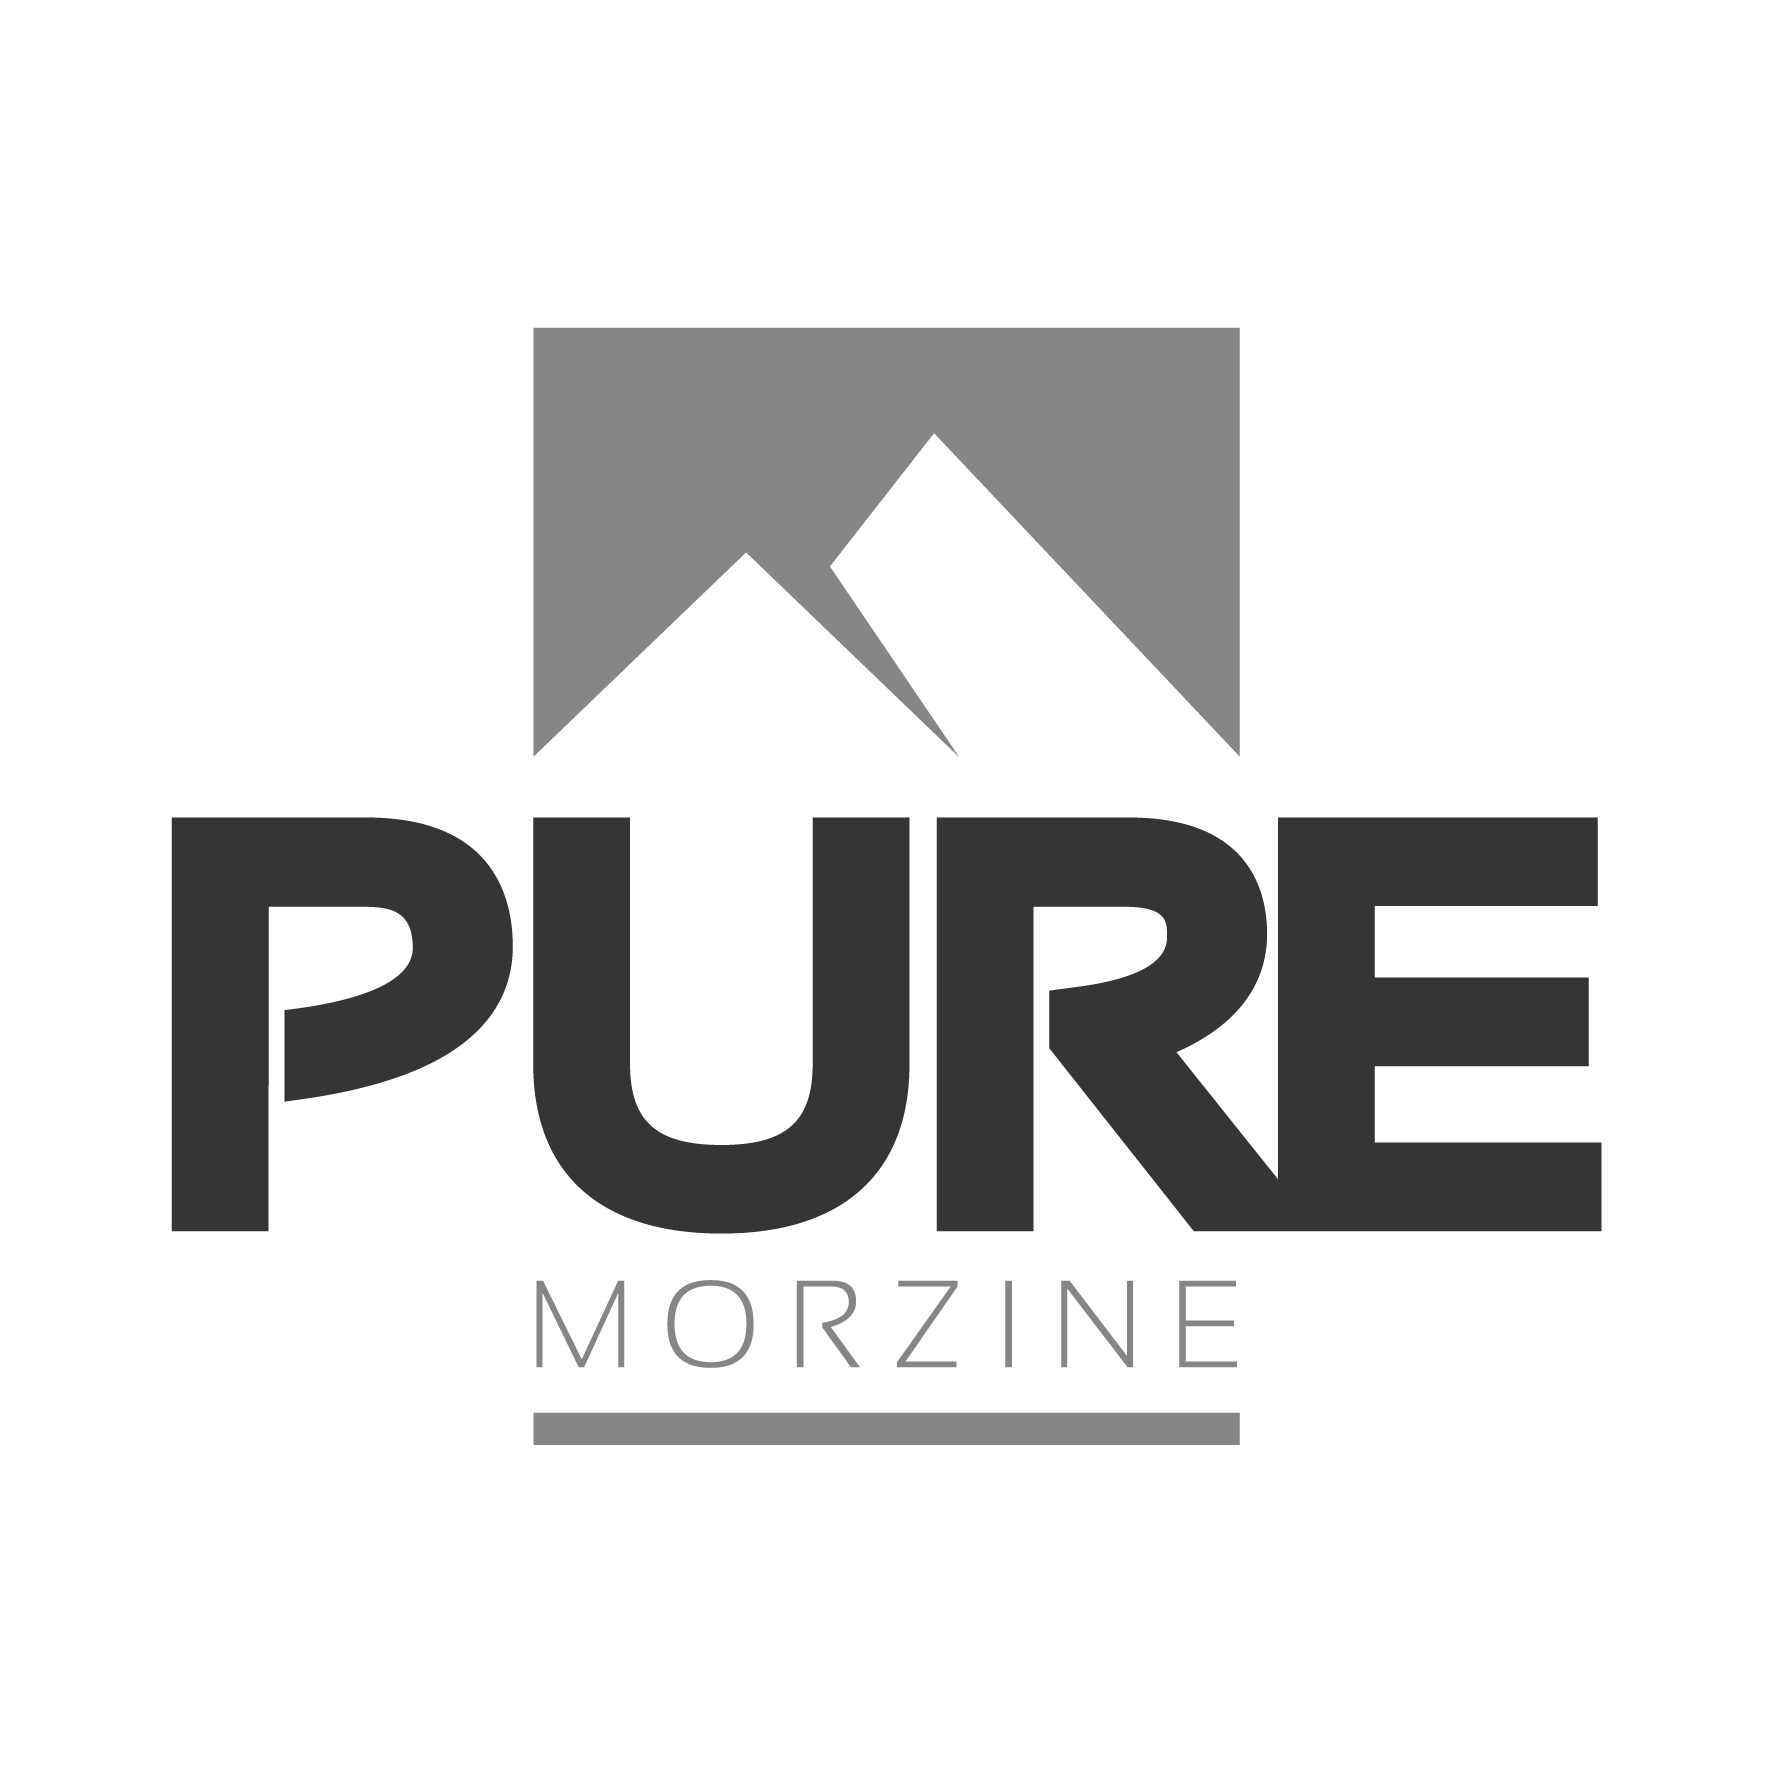 PureMorzine_clair.png#asset:1476